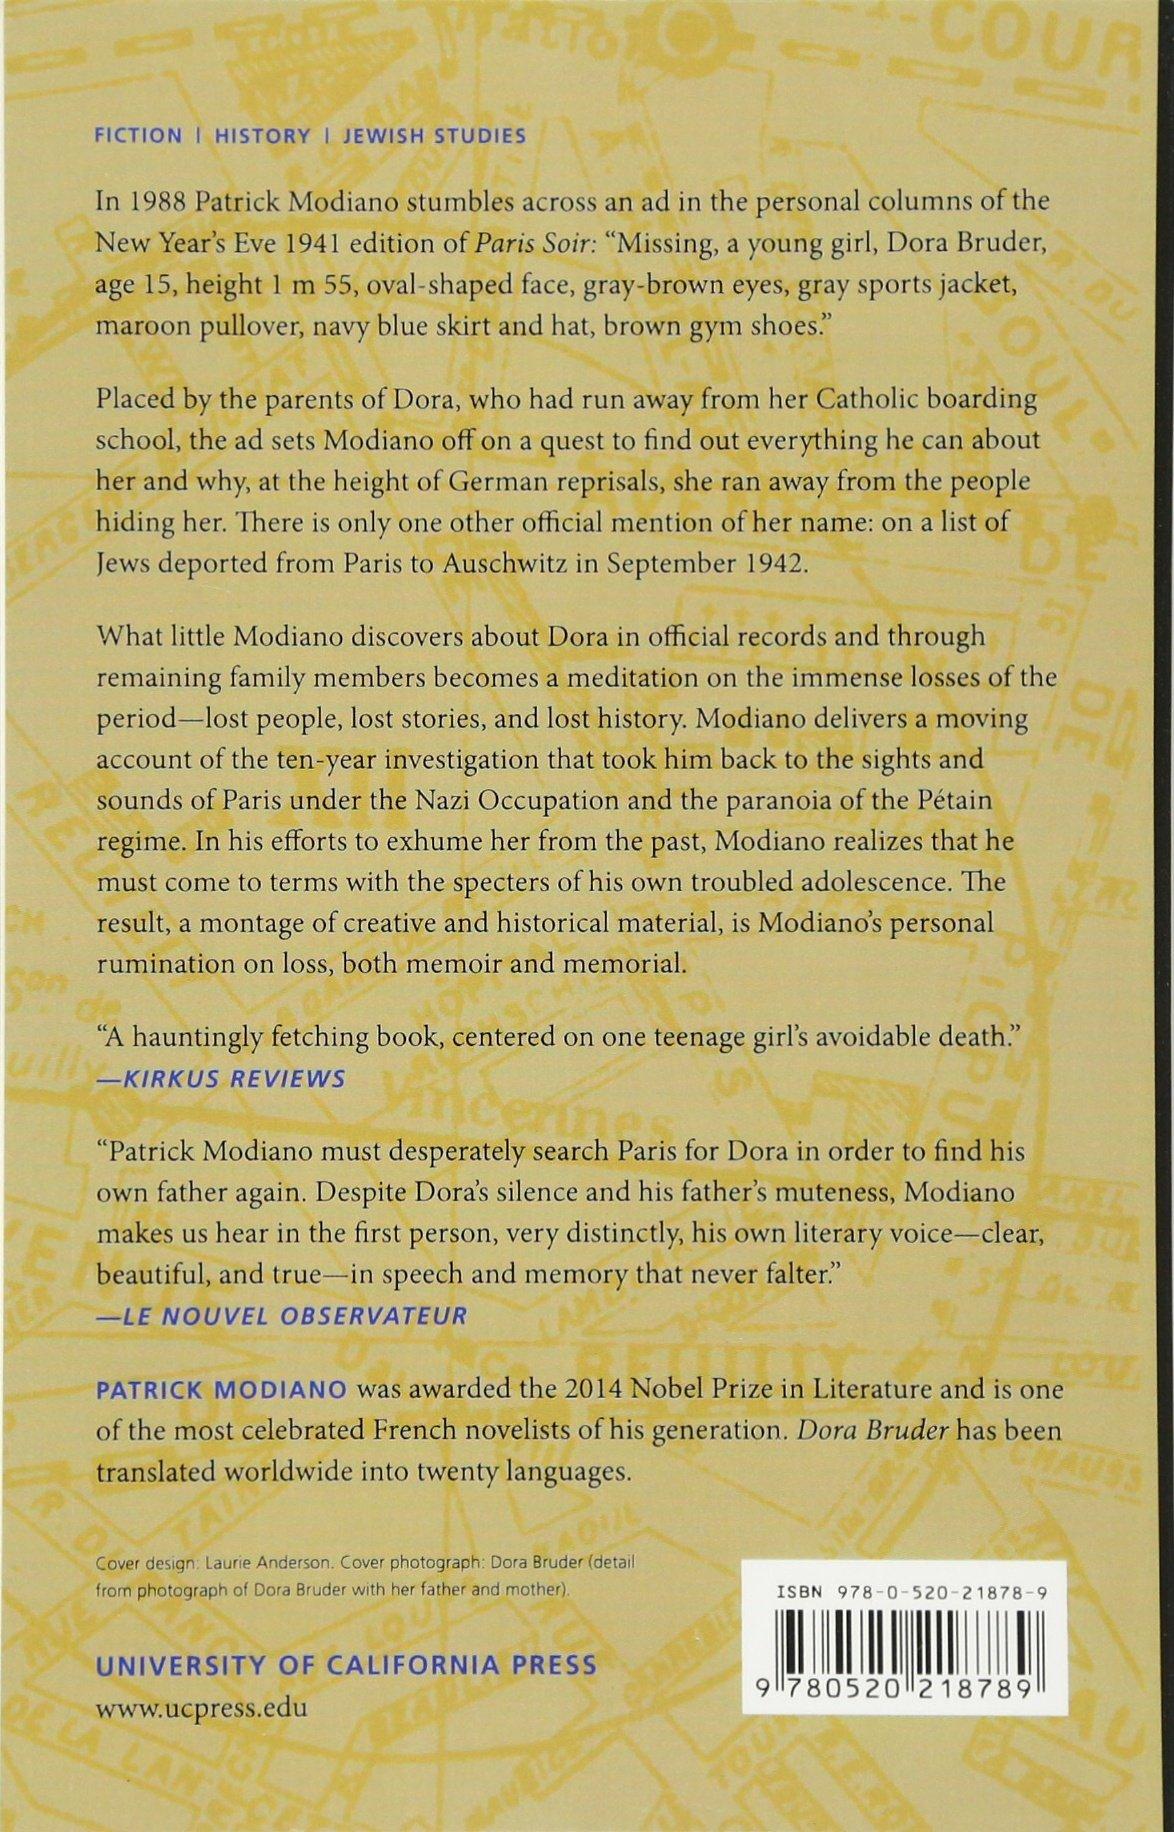 Amazon: Dora Bruder (9780520218789): Patrick Modiano, Joanna Kilmartin:  Books